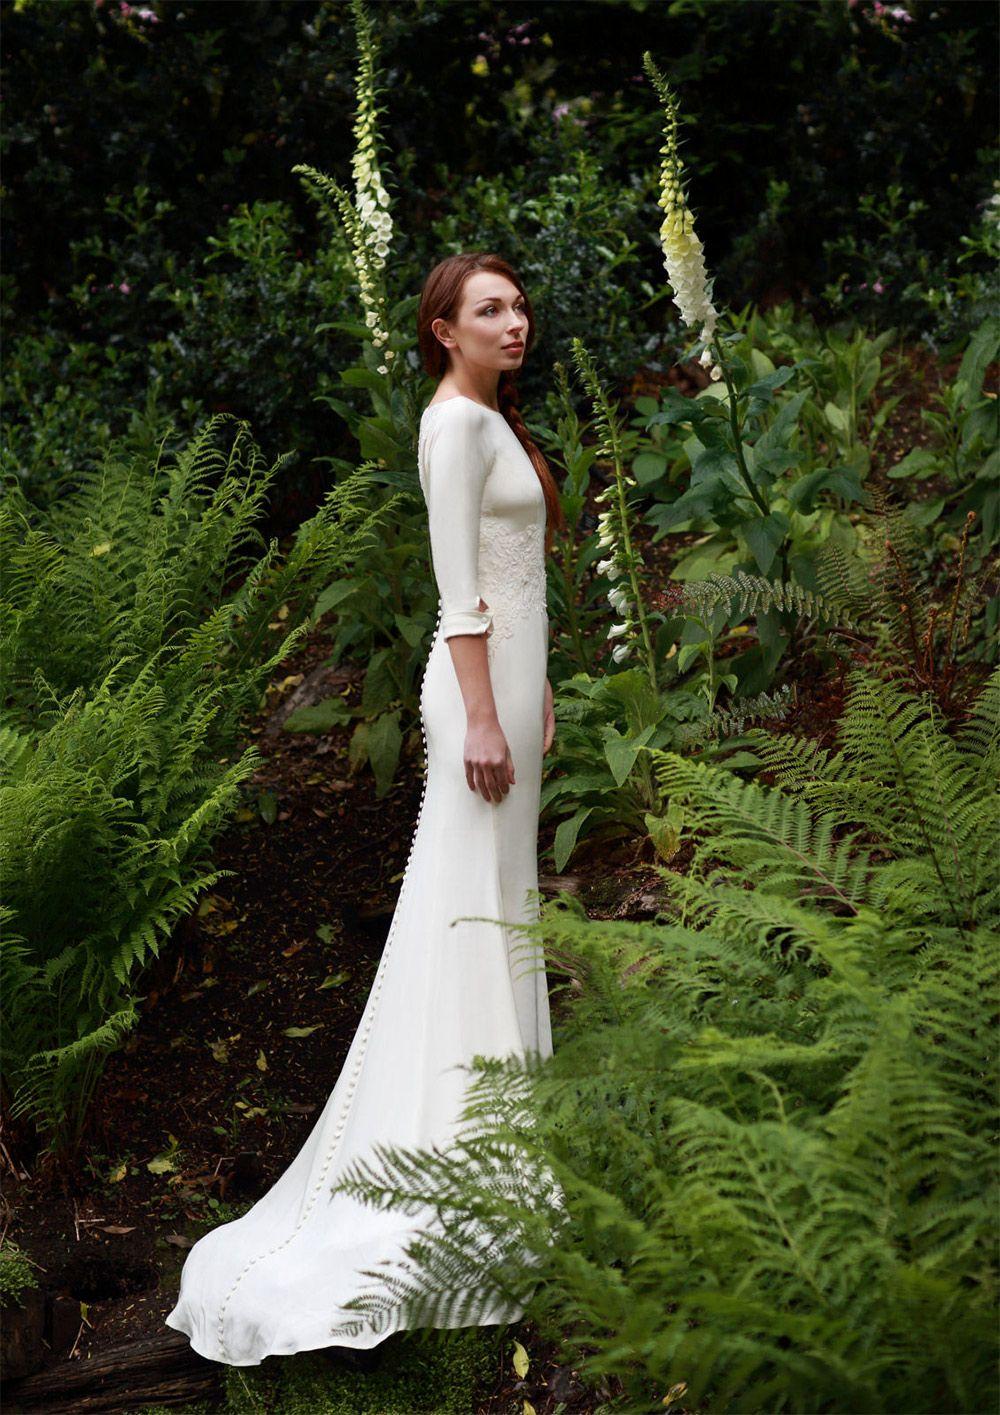 Twilight wedding dresses steal bella swans bridal style bella twilight wedding dresses steal bella swans bridal style junglespirit Gallery